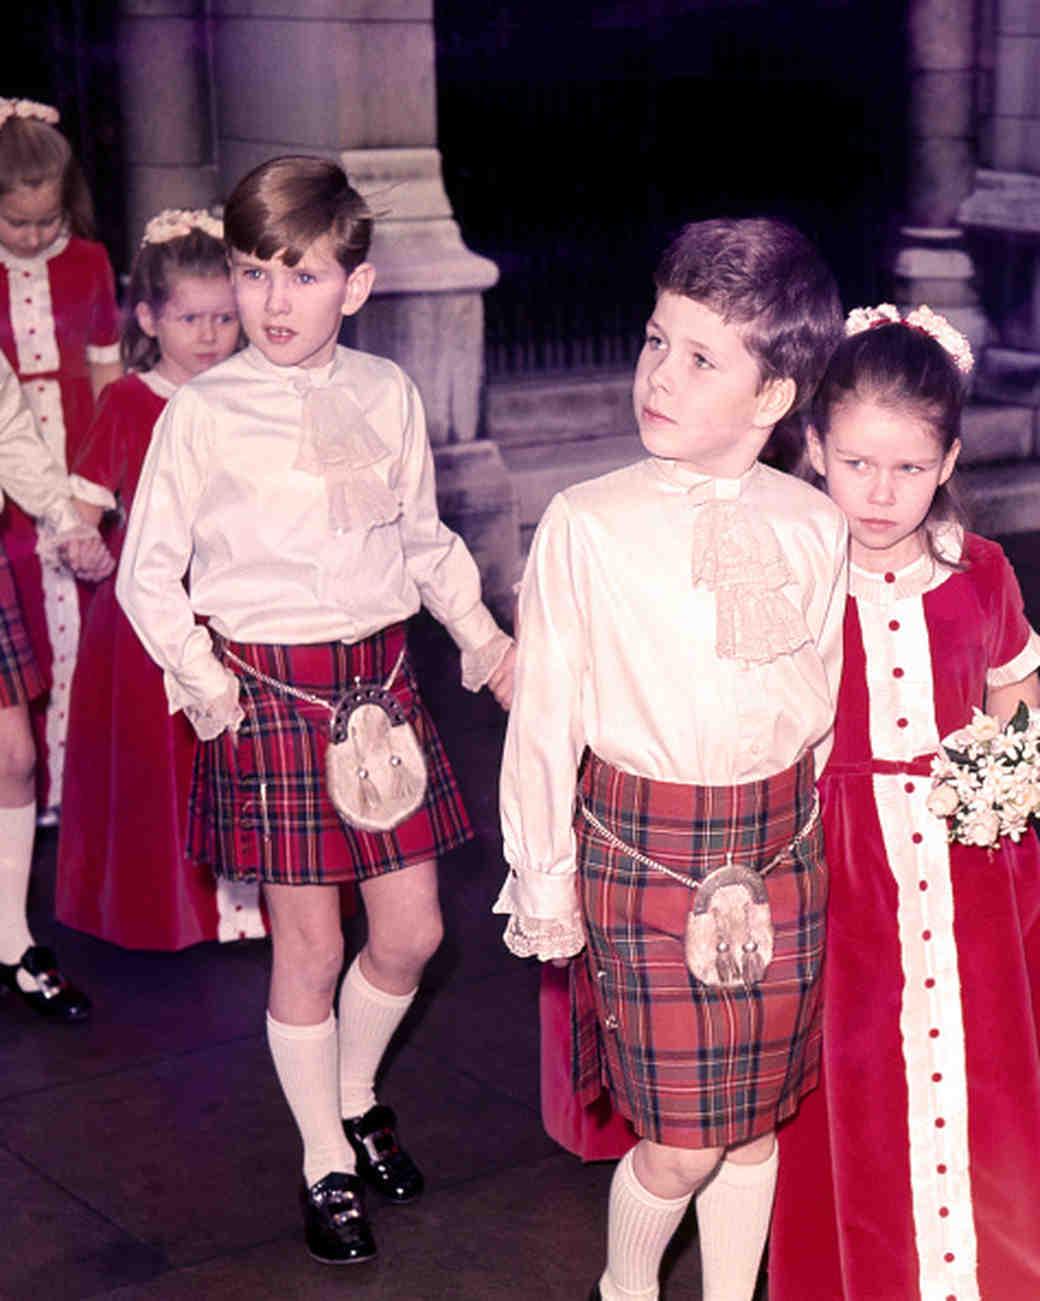 royal-children-wedding-458894070-0415.jpg